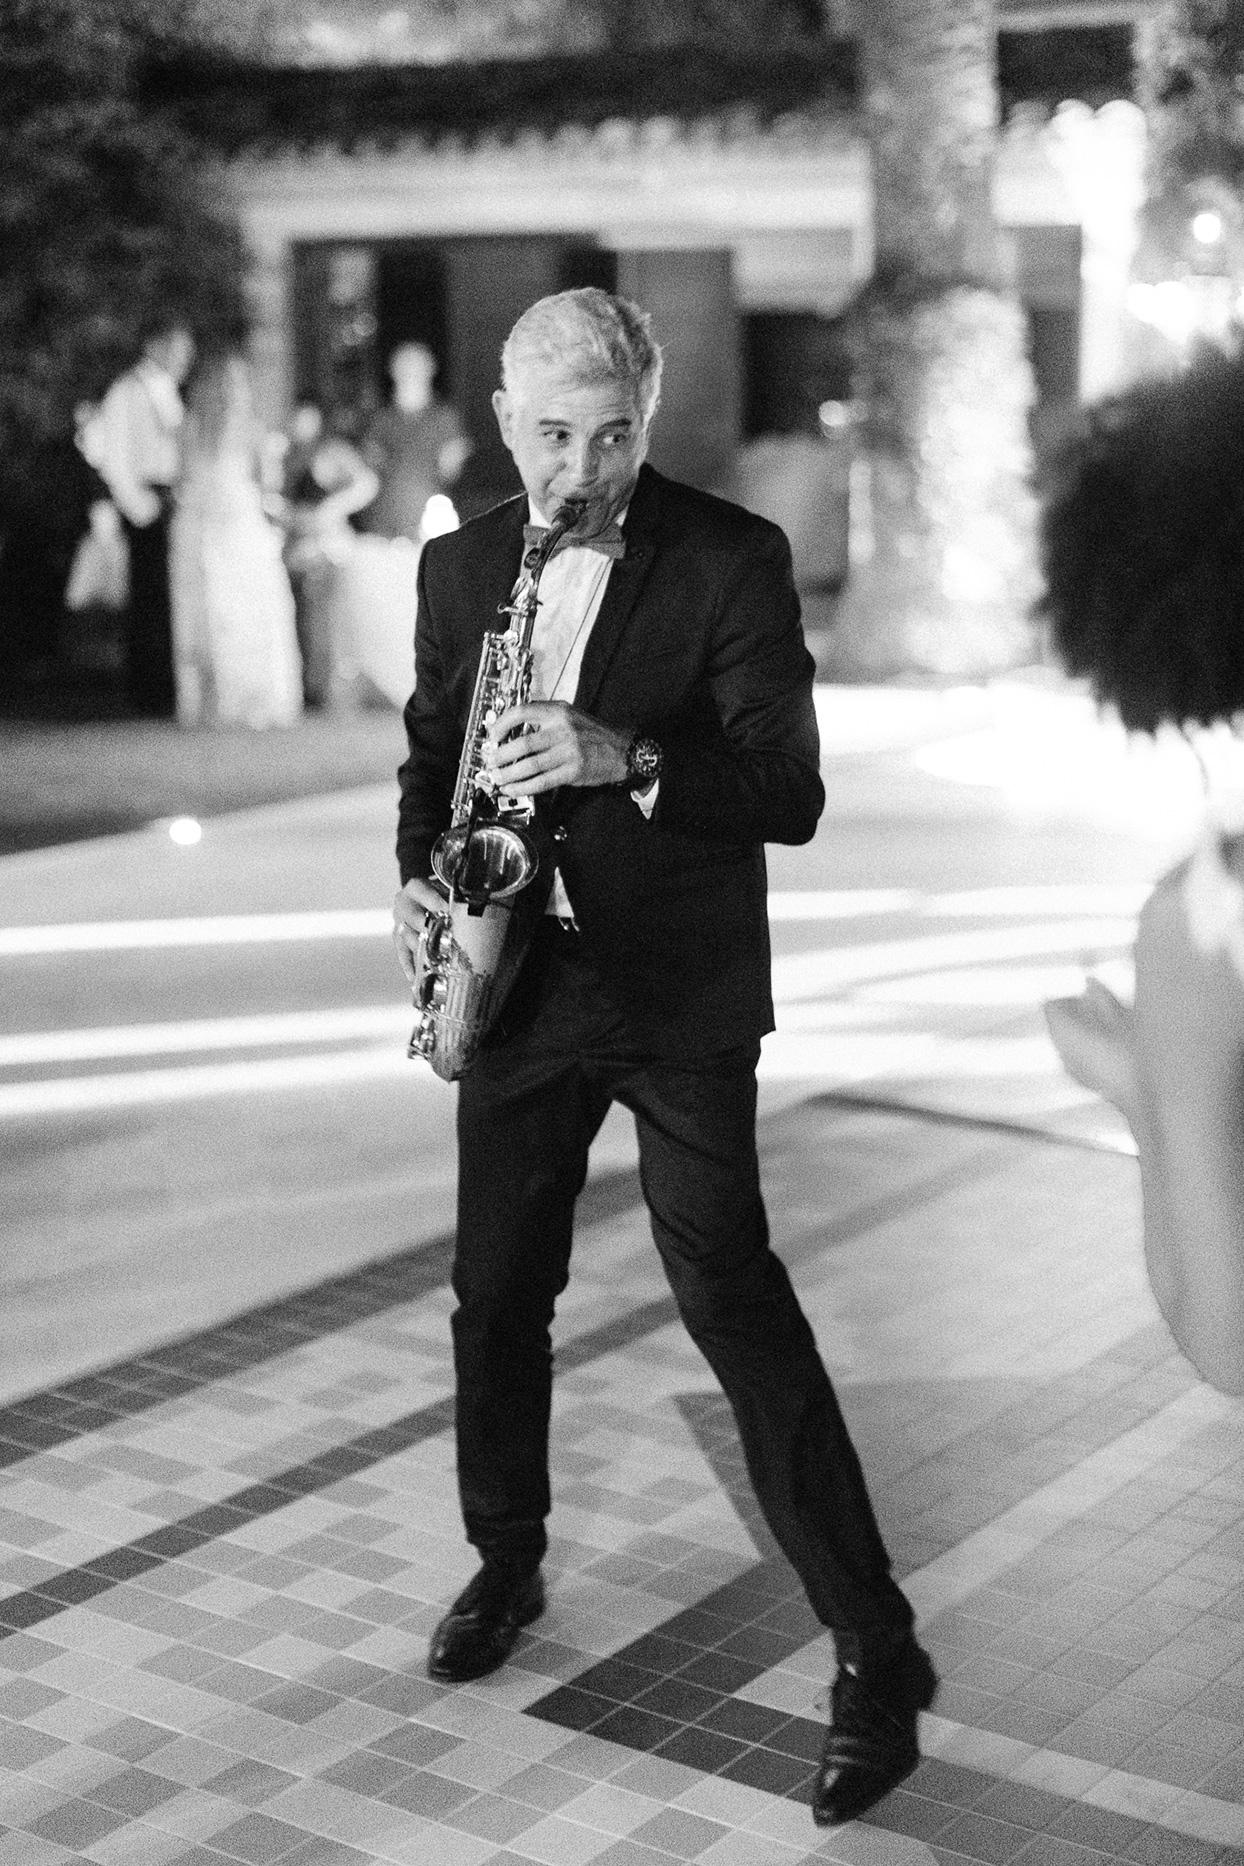 patricia ralph wedding saxophone player